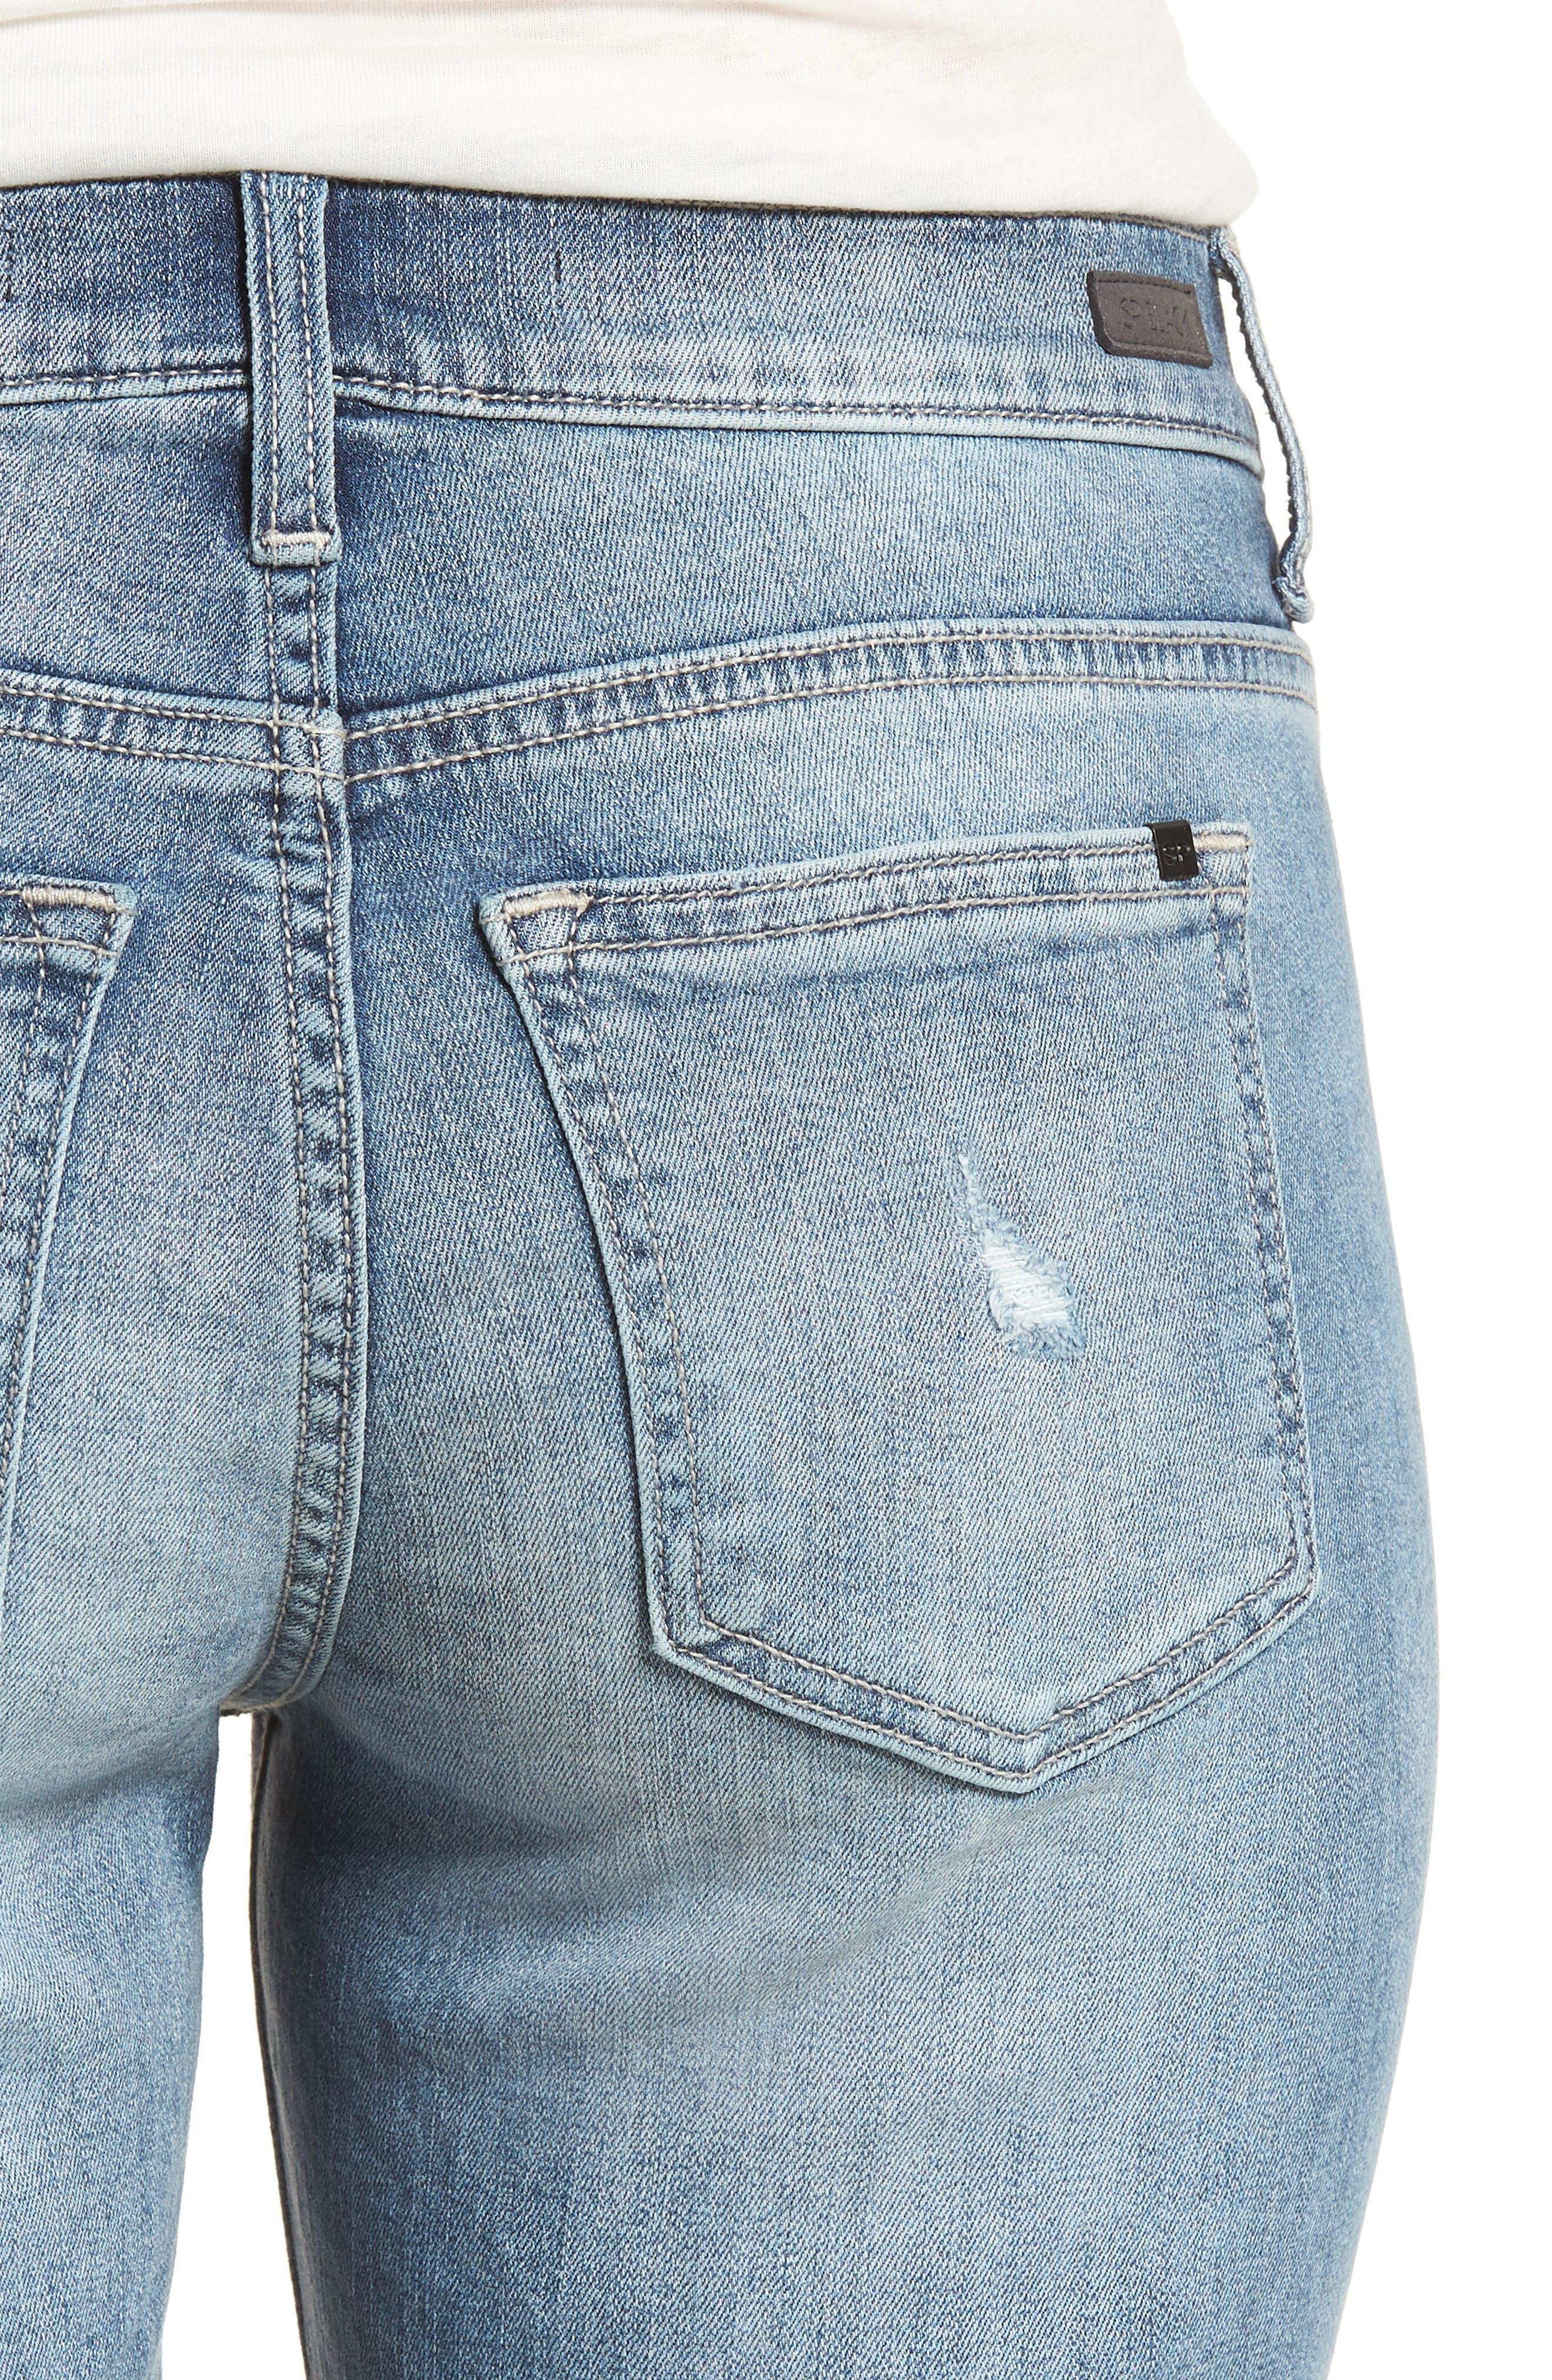 Ripped Denim Bermuda Shorts,                             Alternate thumbnail 4, color,                             Med Wash